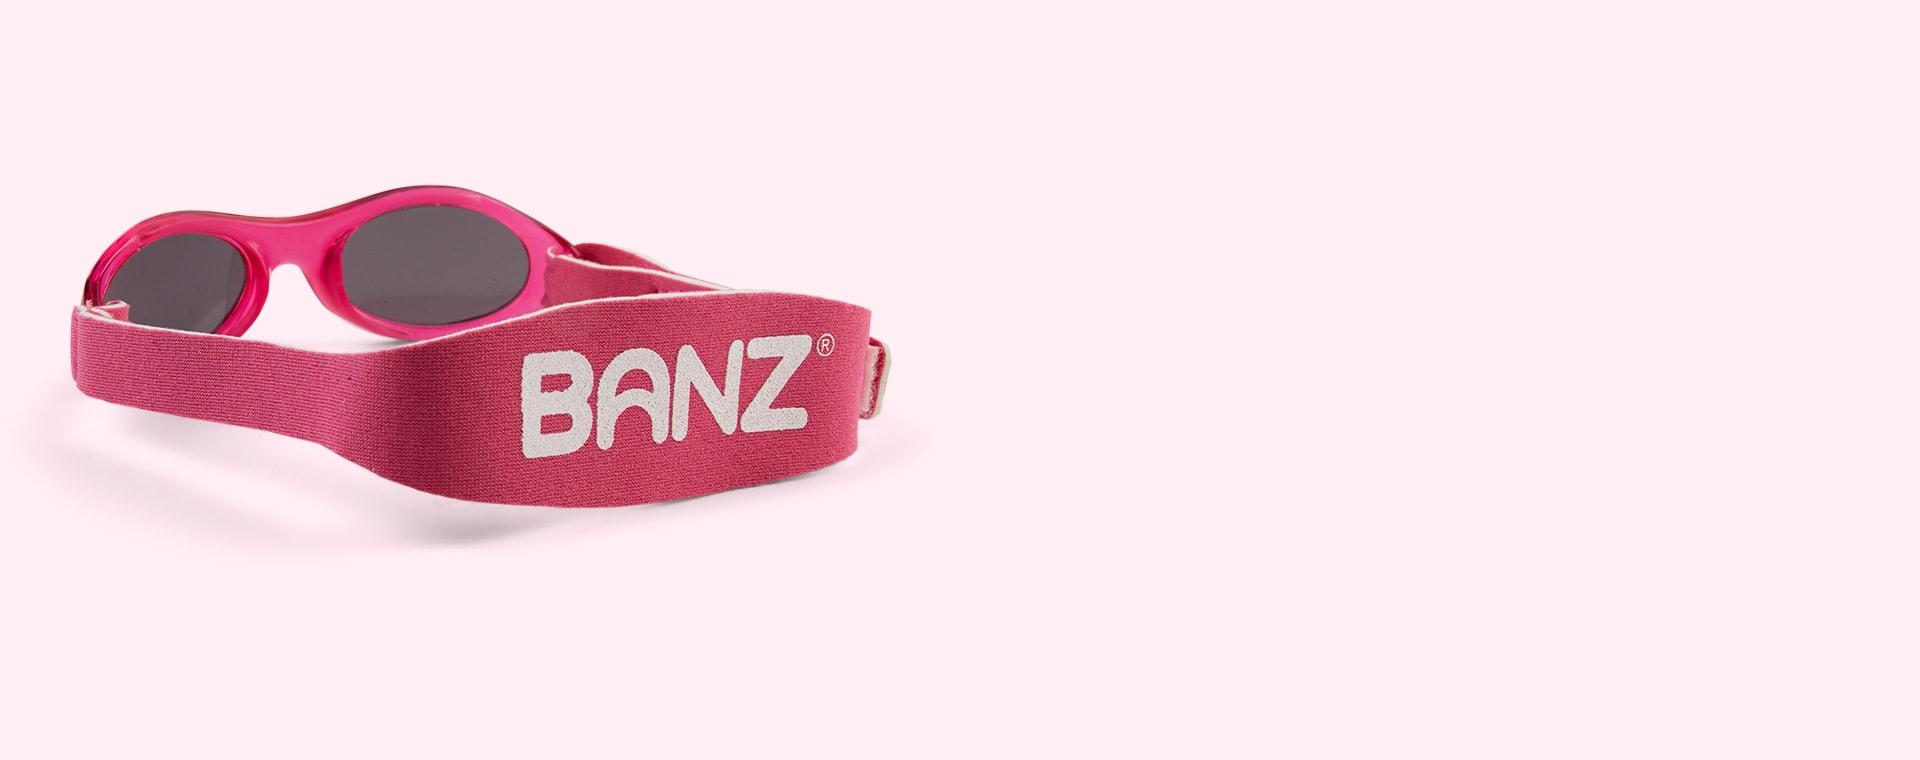 Pink Banz Adventure Sunglasses